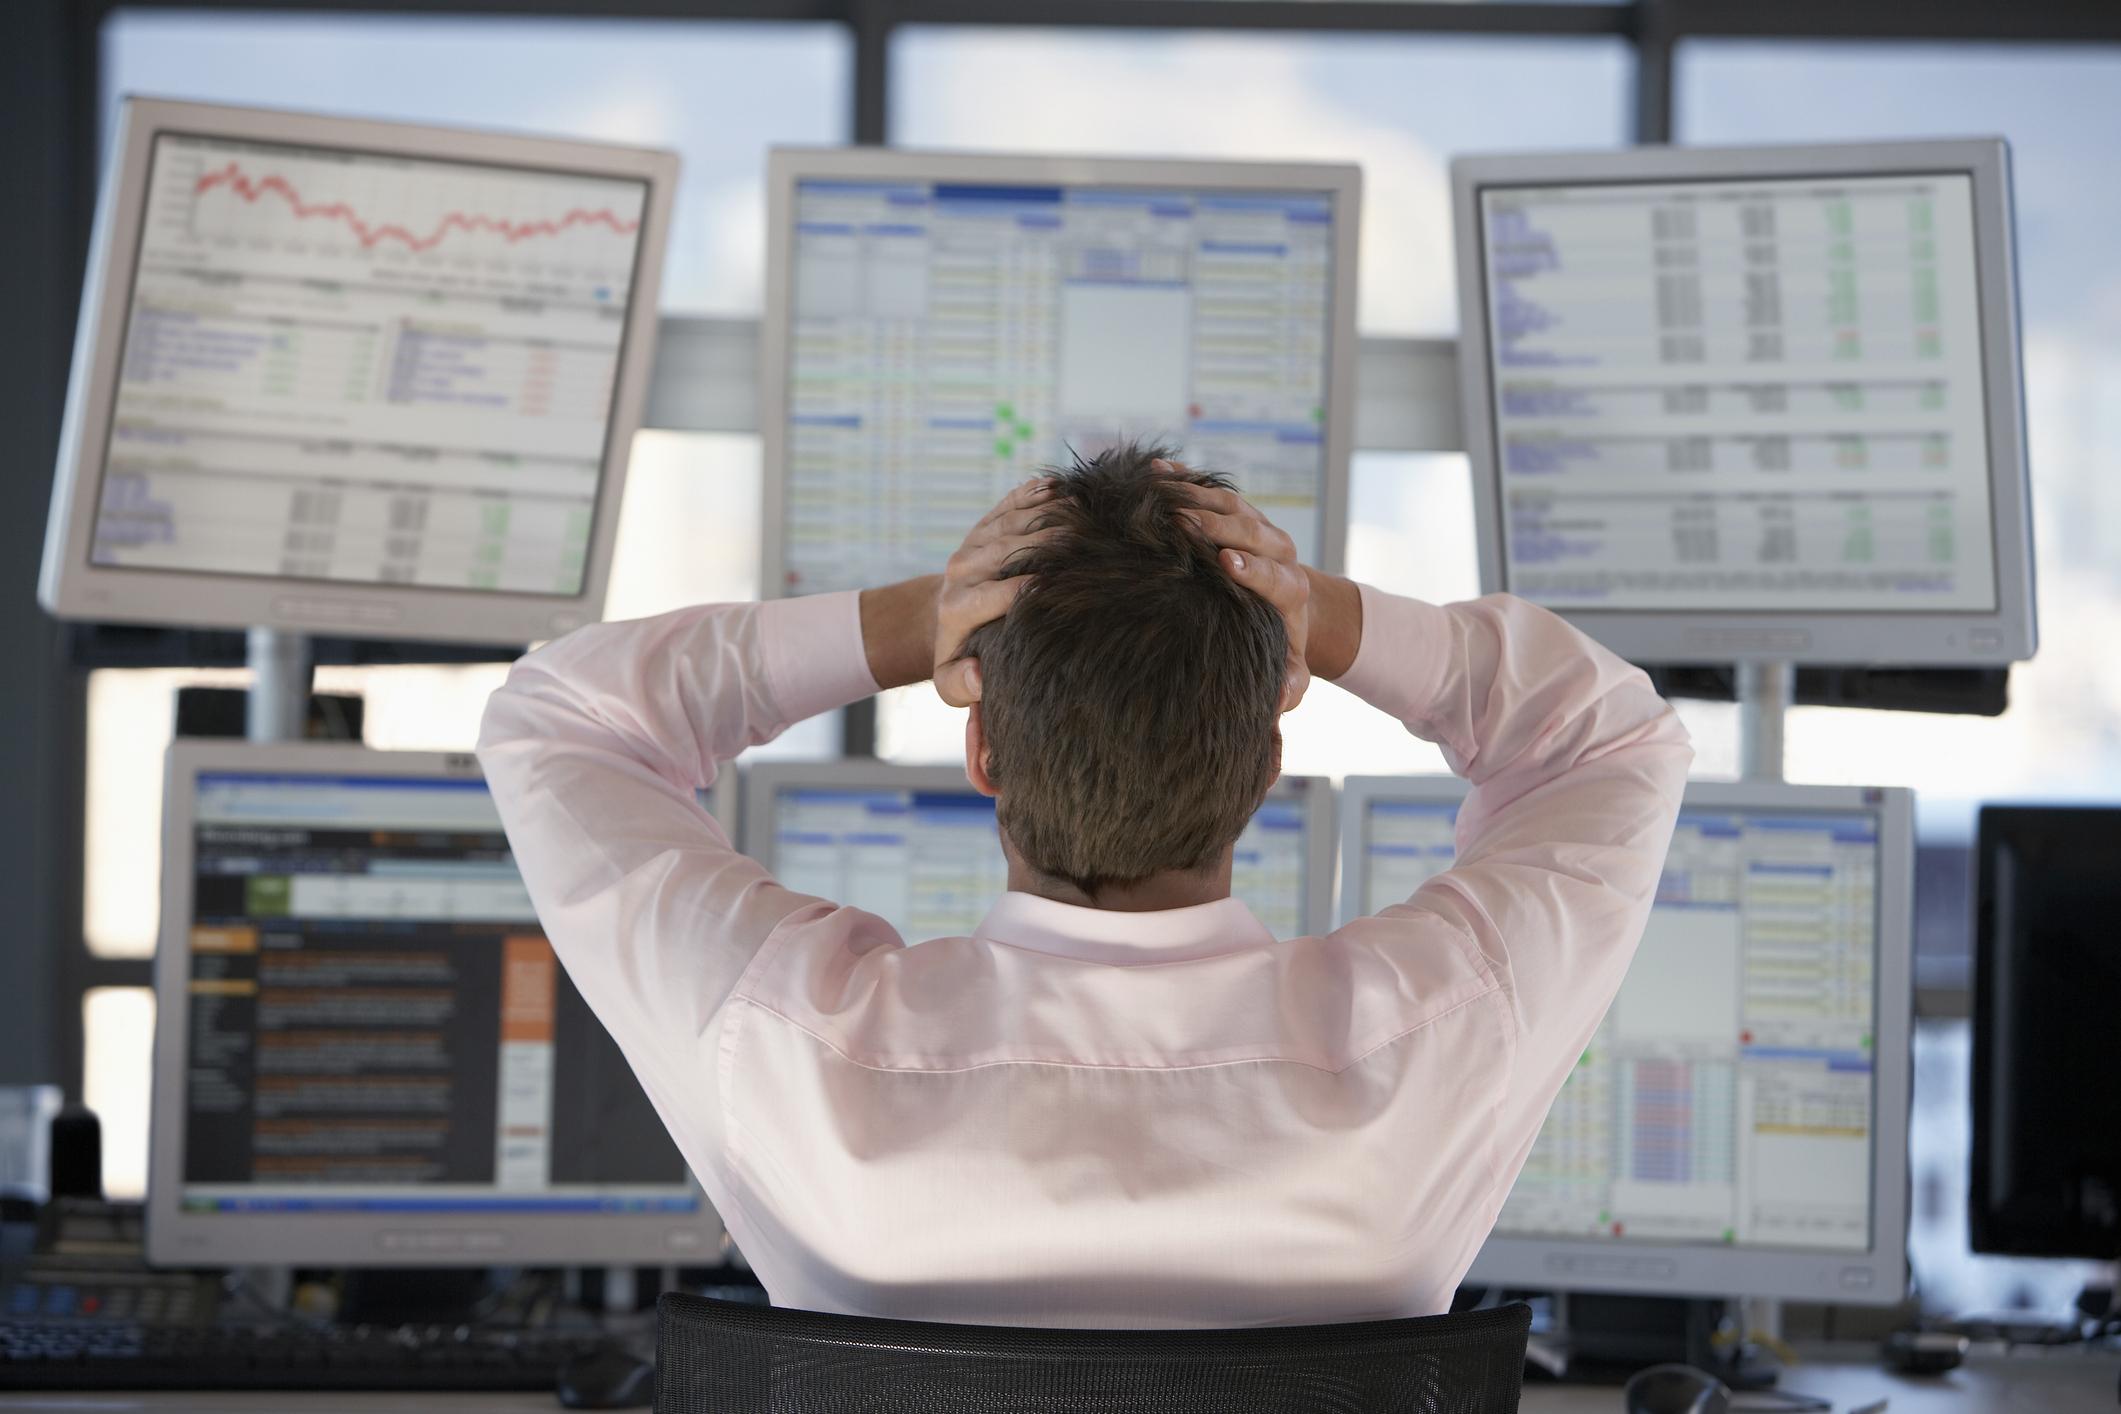 A frustrated investor looking at losses on his computer monitors.